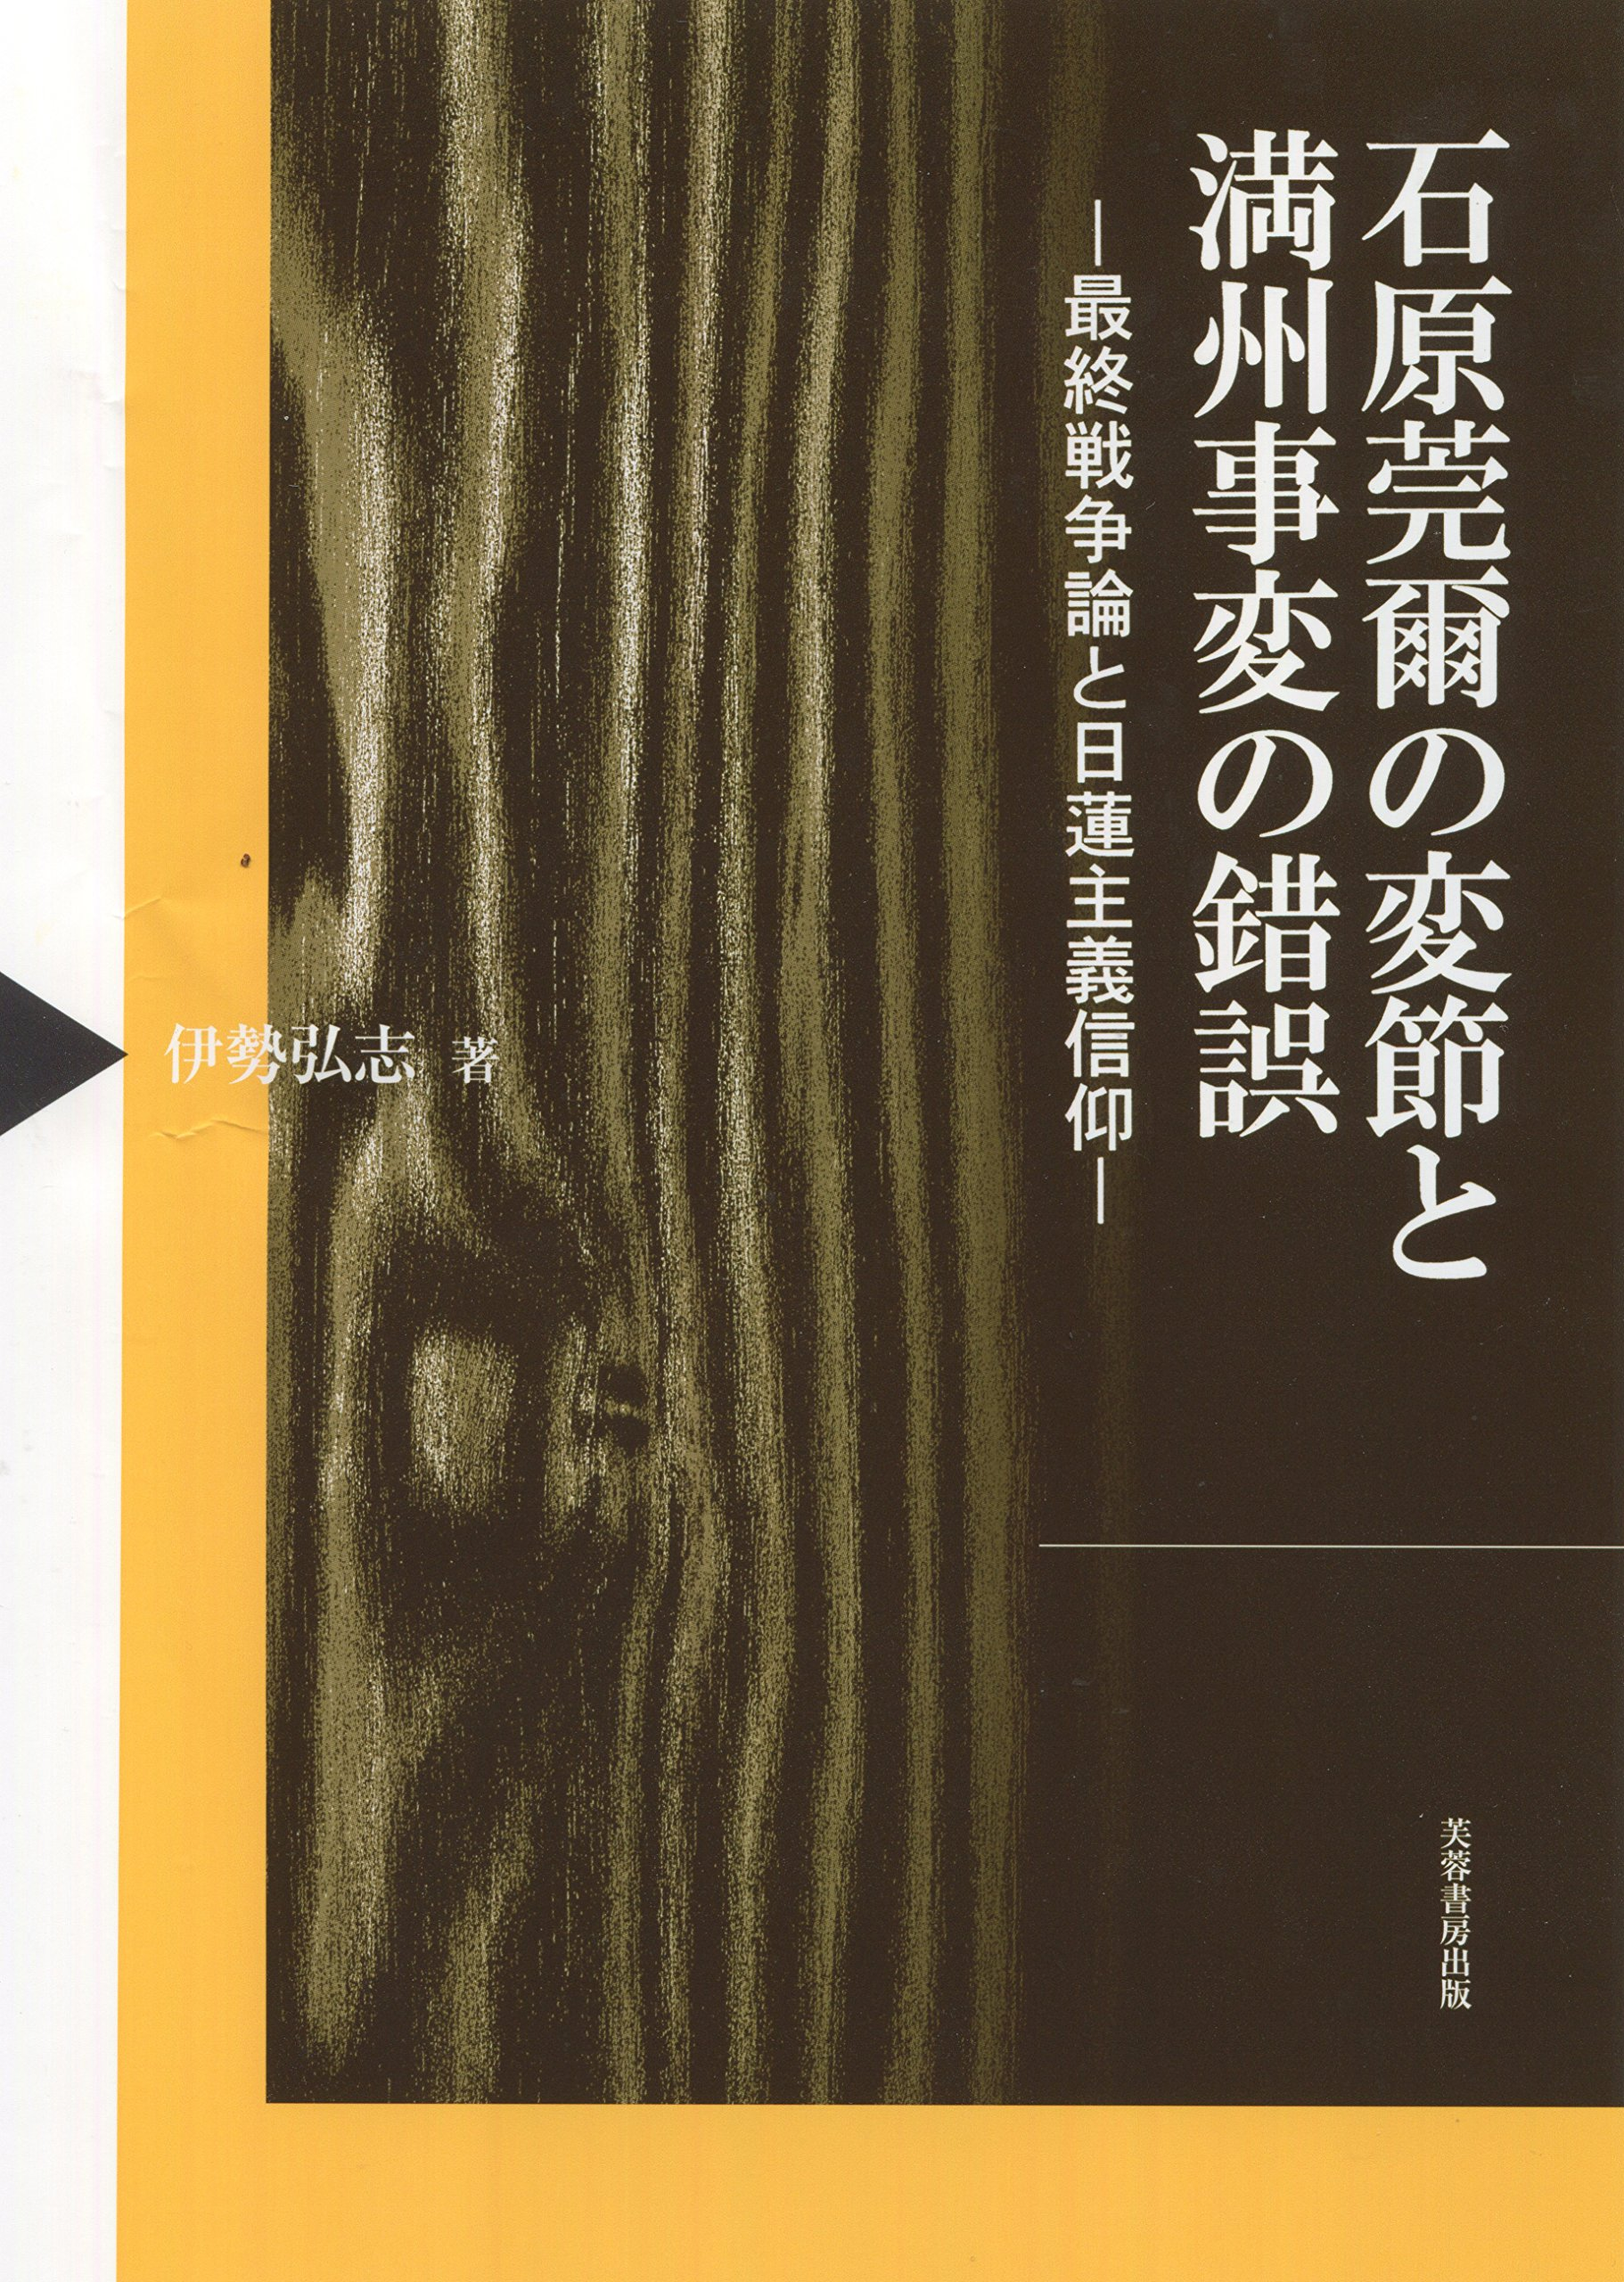 伊勢弘志 著『石原莞爾の変節と満州事変の錯誤――最終戦争論と日蓮主義信仰』